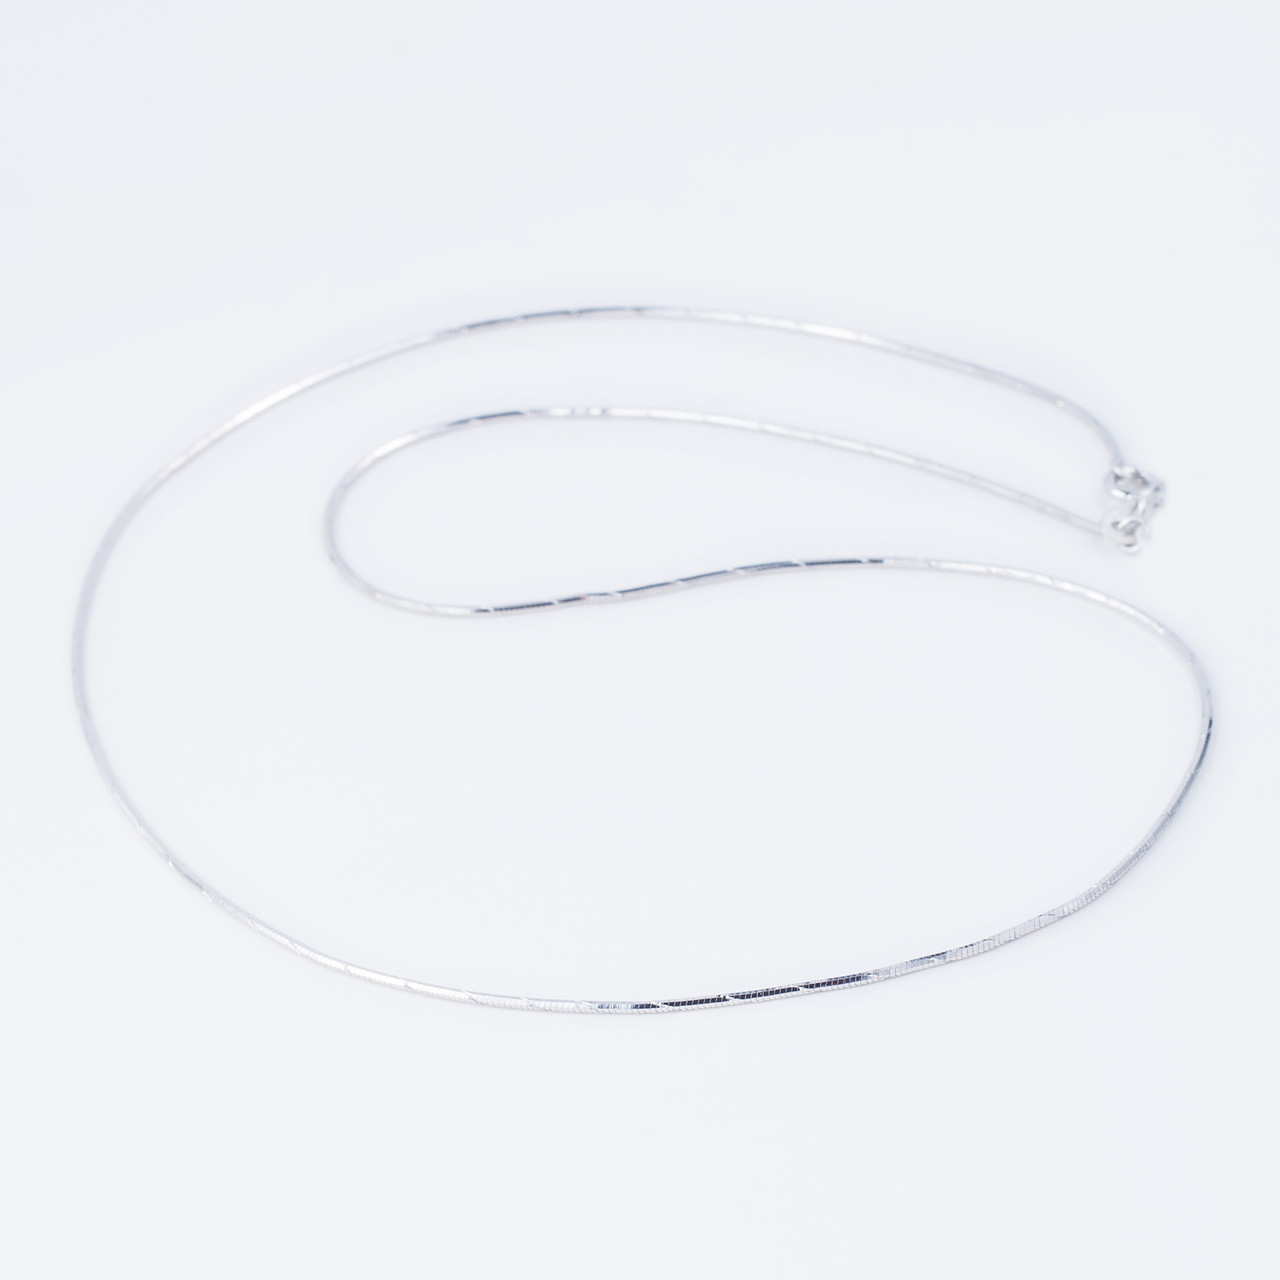 Ланцюжок TOP Silver розмір 50,0 3,20 м 530030/3